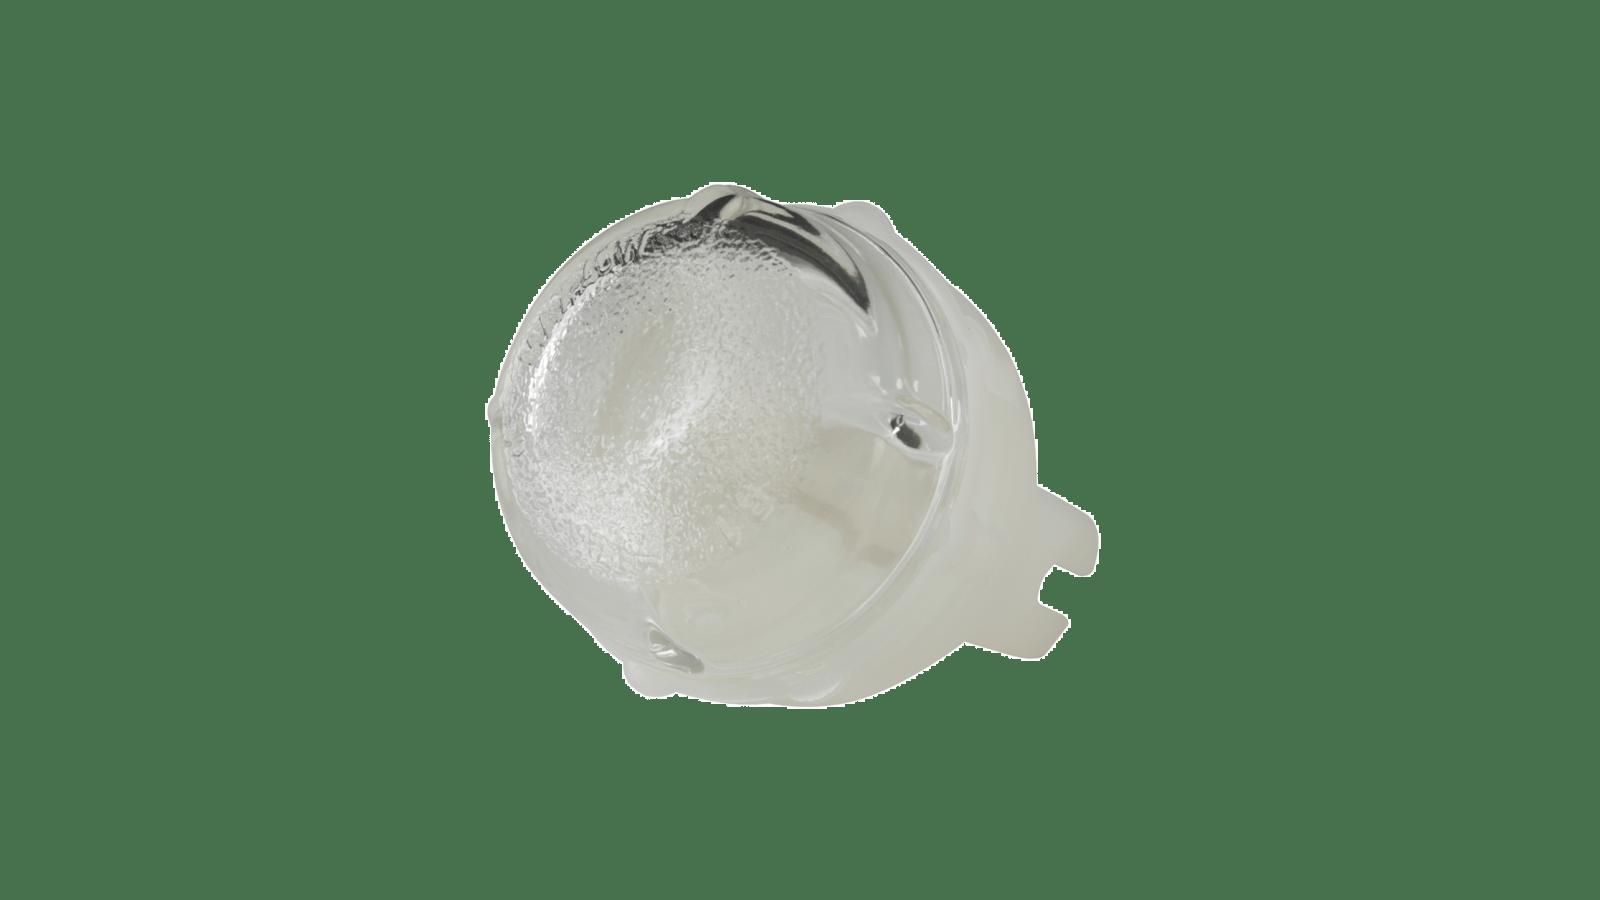 647309 00647309 GENUINE Bosch Oven Lampholder Glass Cover Part No